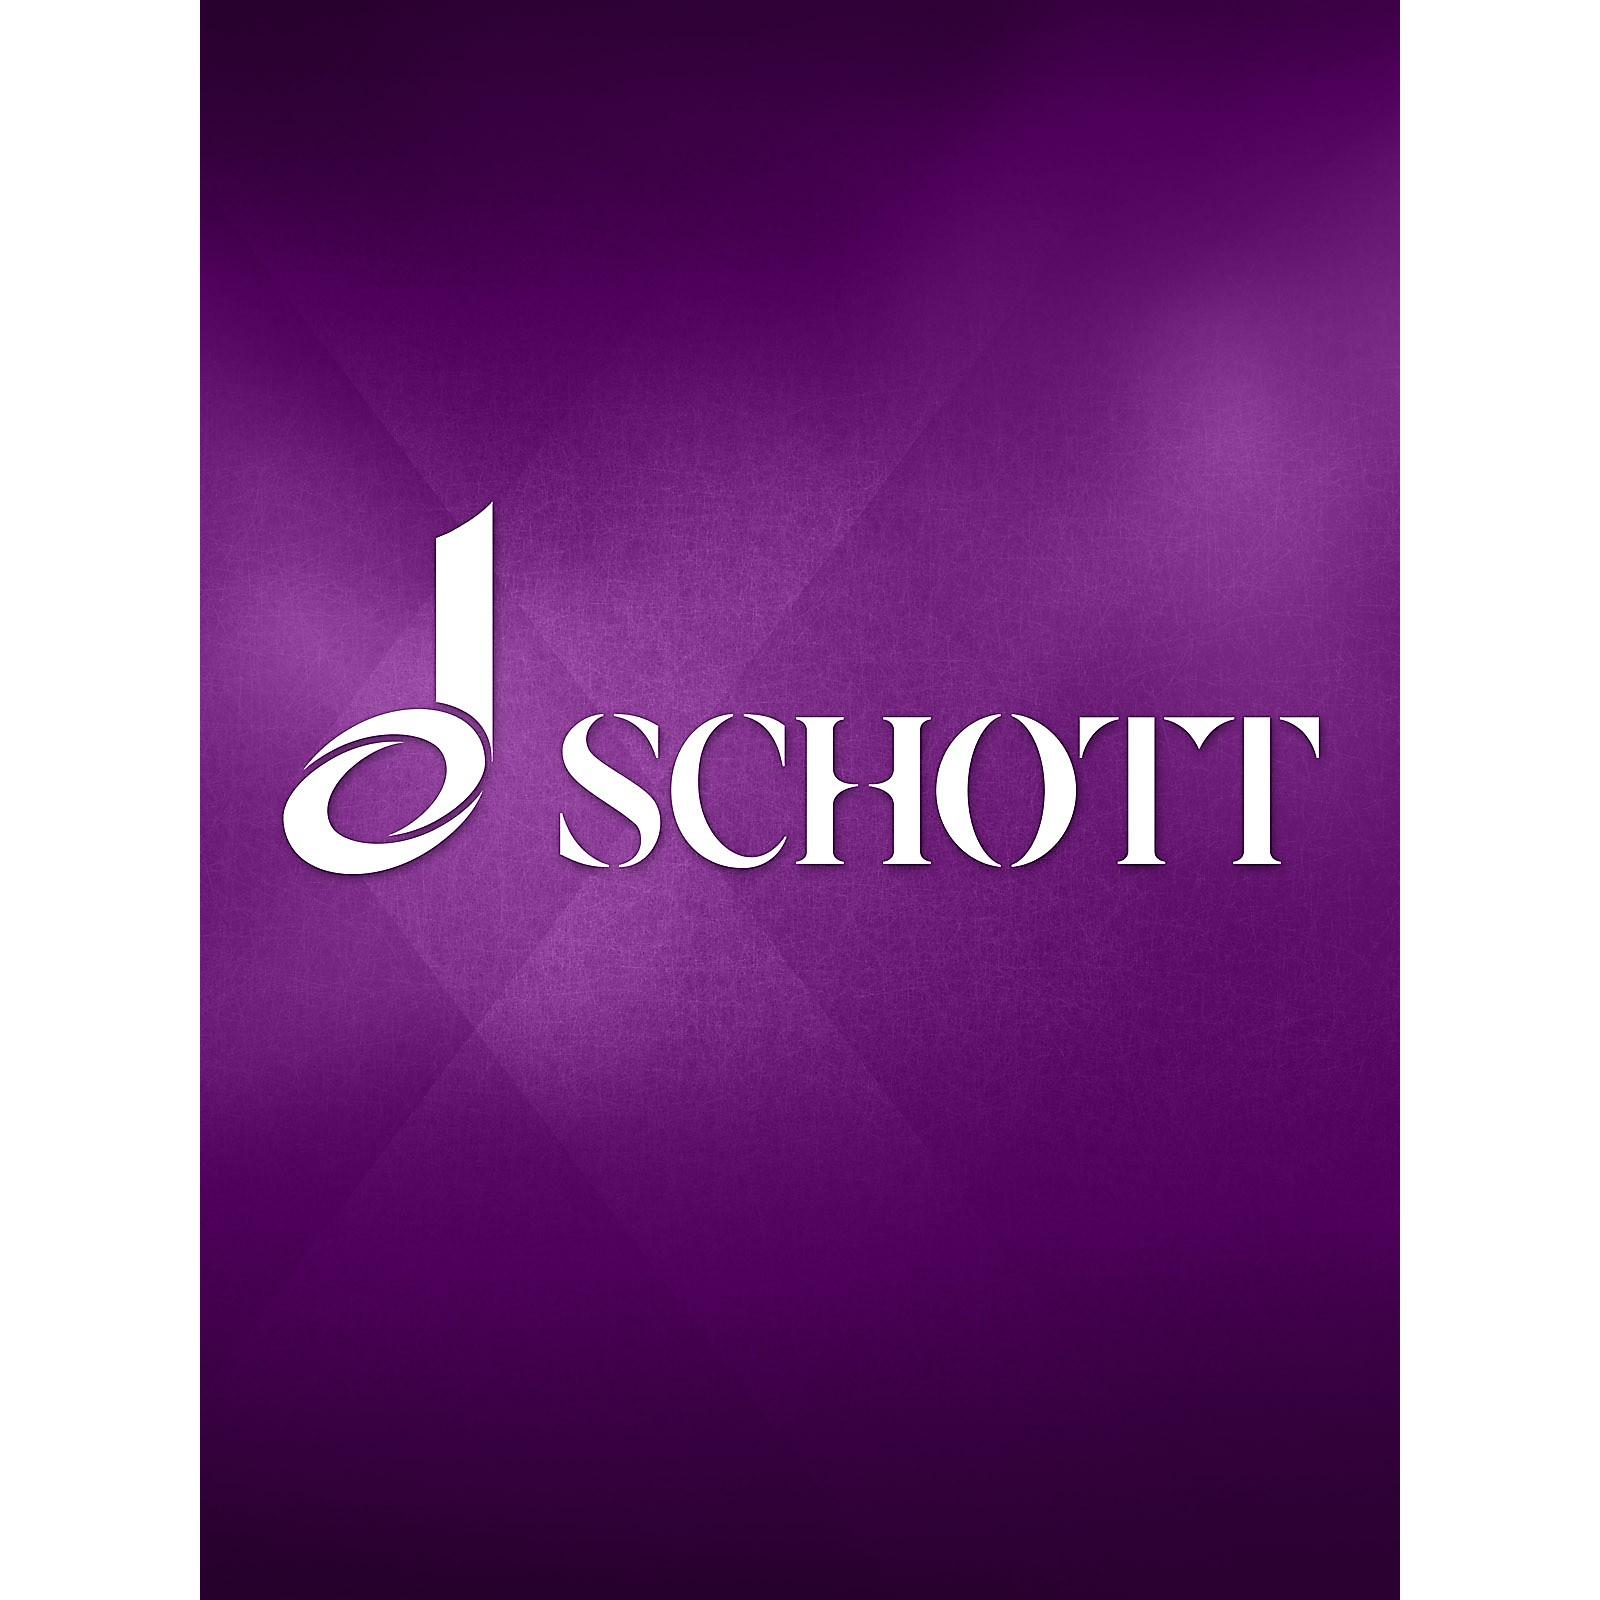 Schott Operas and Operettas - Volume 1 Schott Series Composed by Various Arranged by Richard Krentzlin